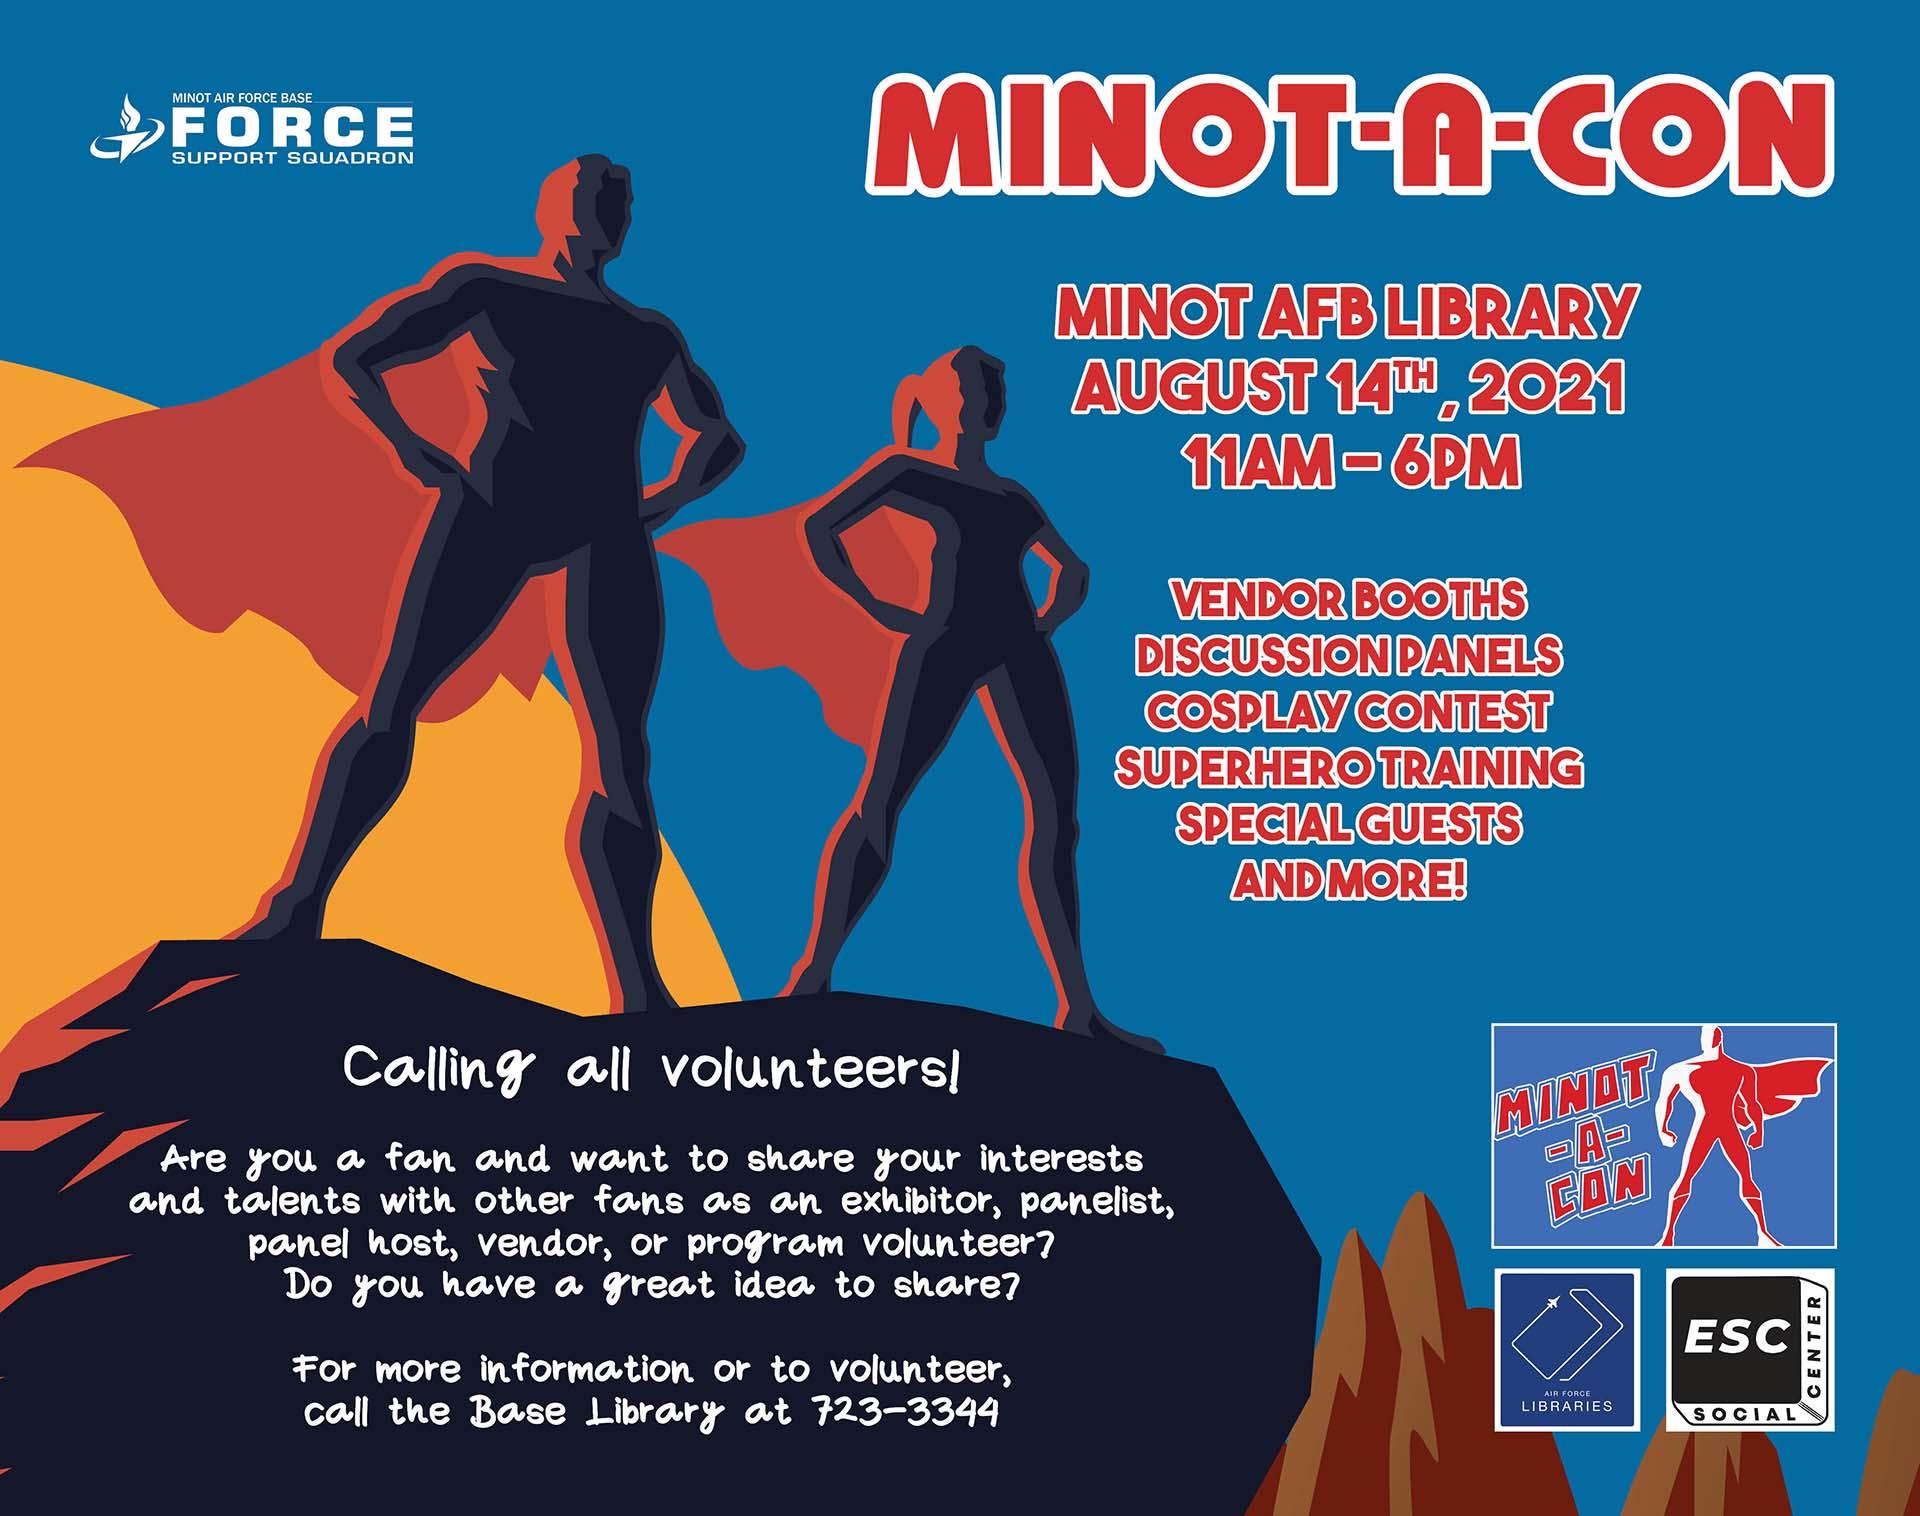 MINOT-A-CON